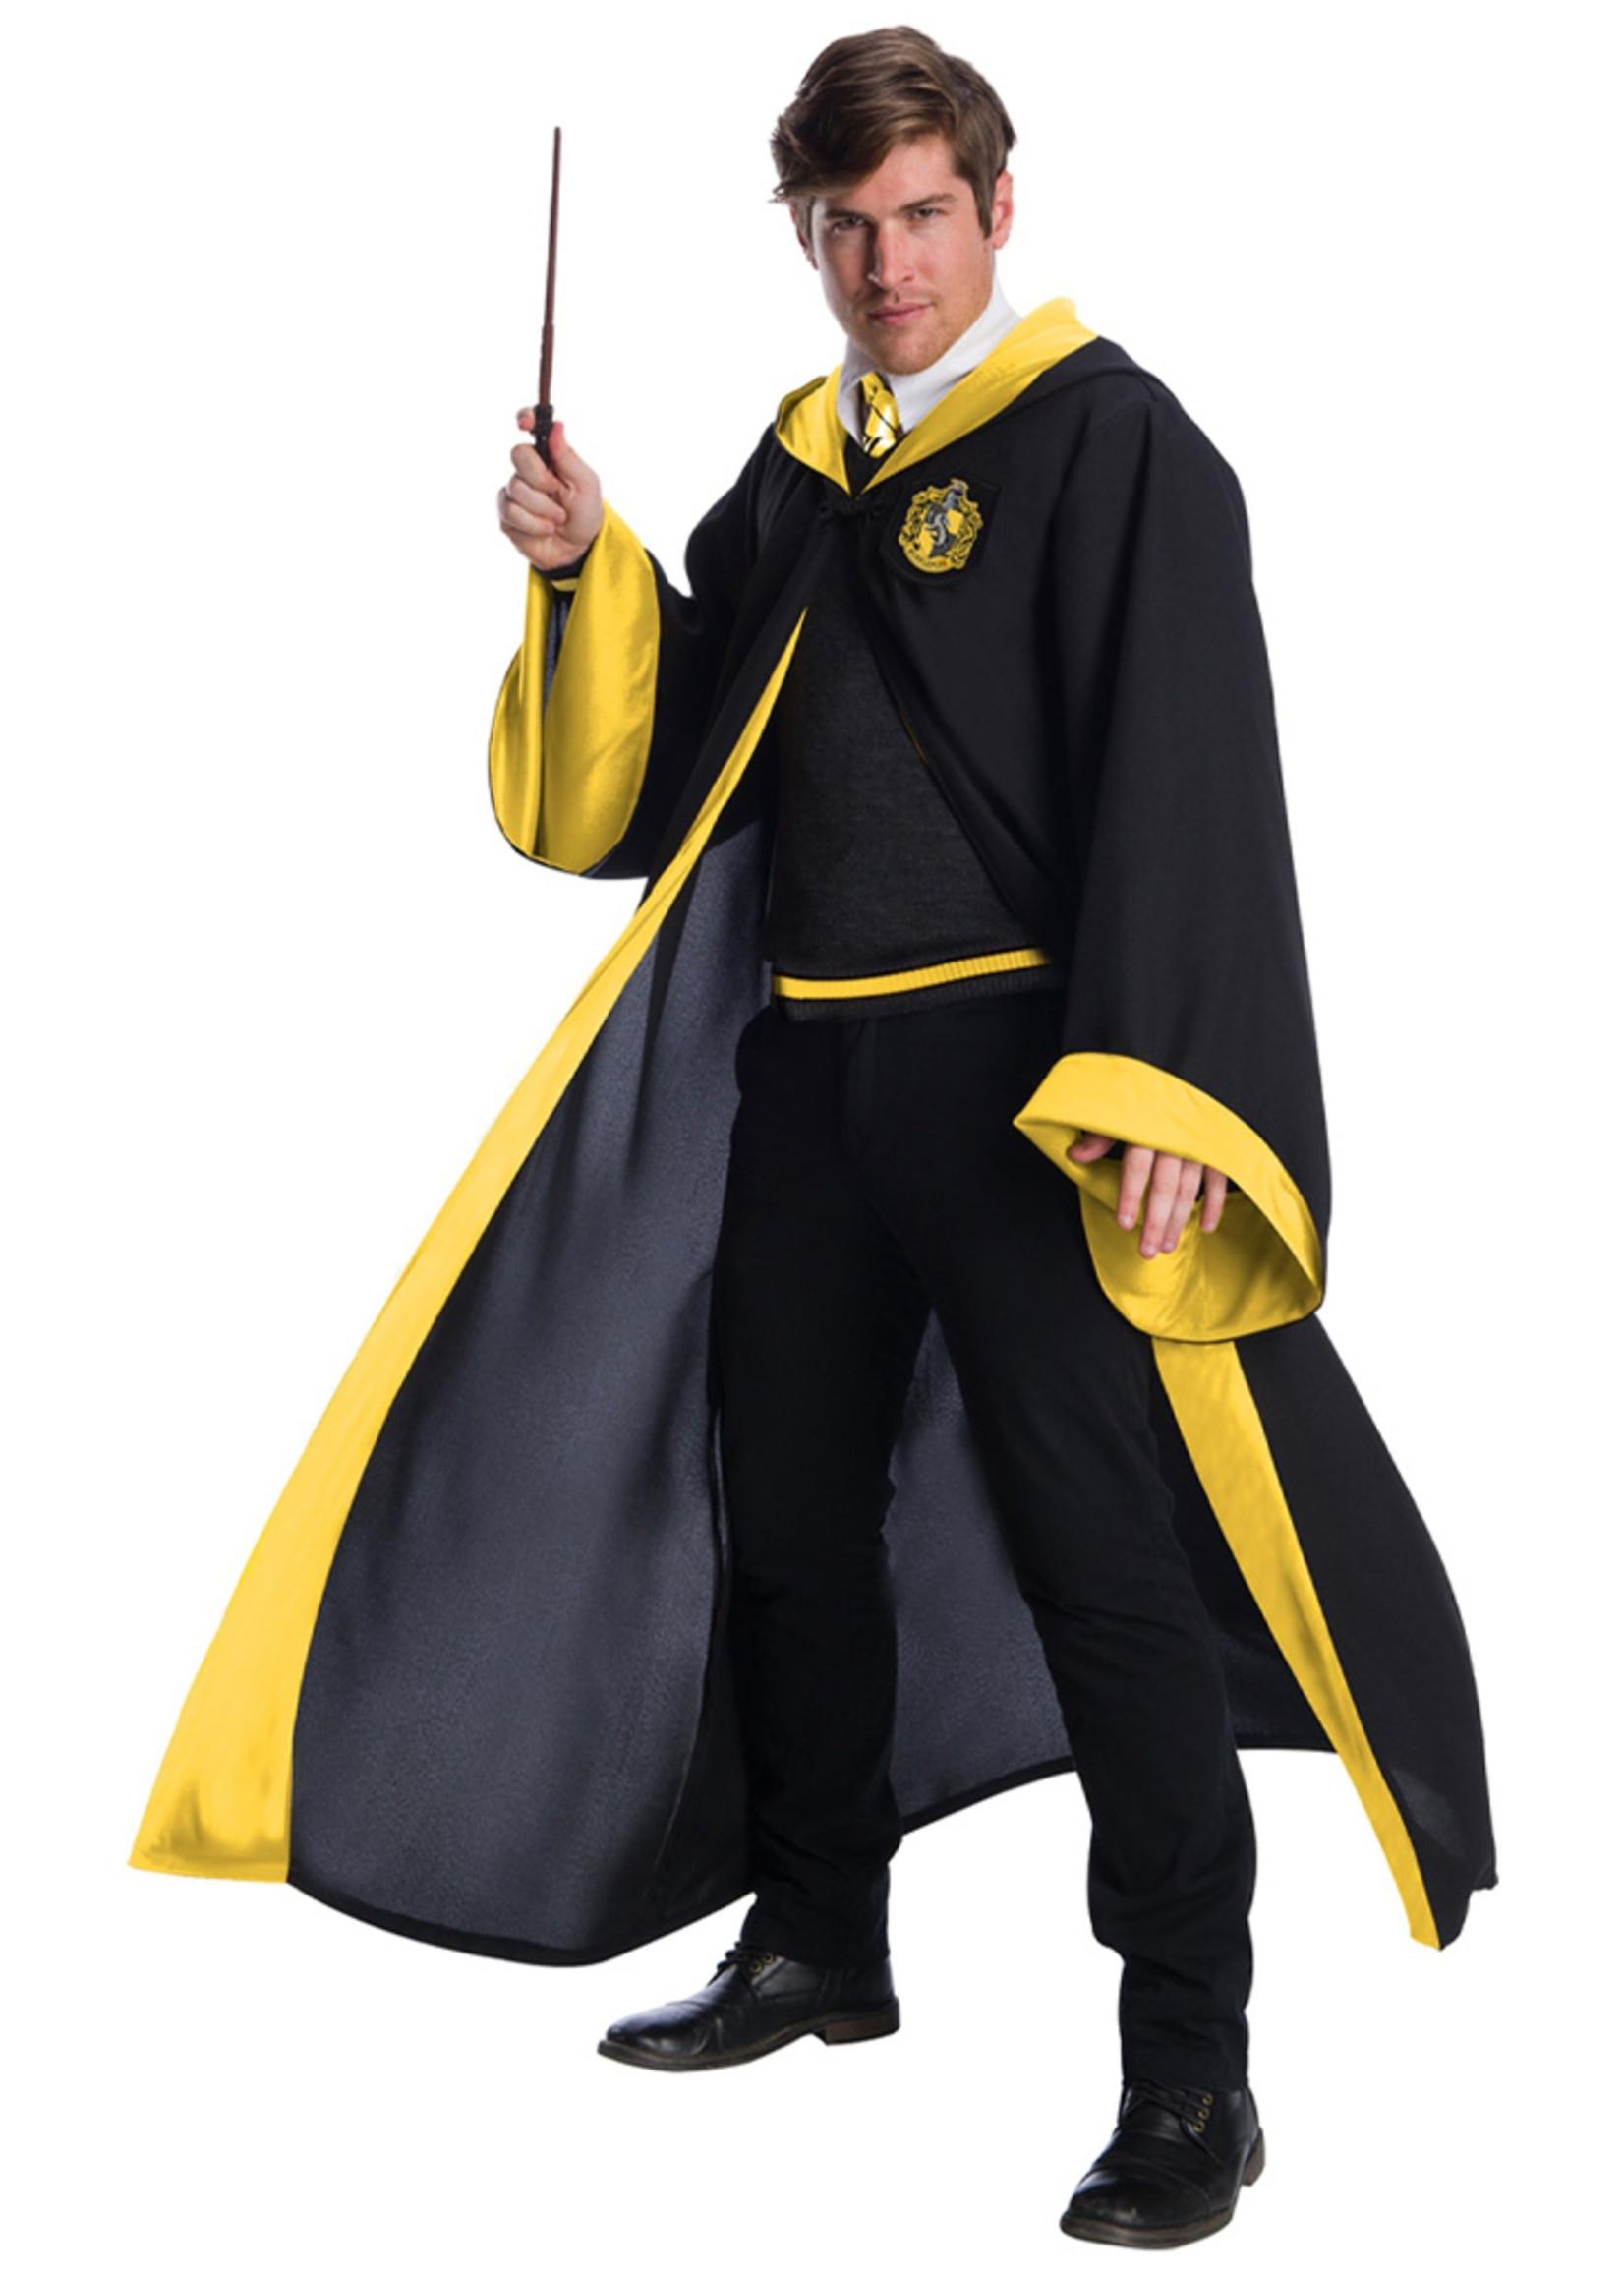 Hufflepuff Student Costume -Harry Potter - Adult